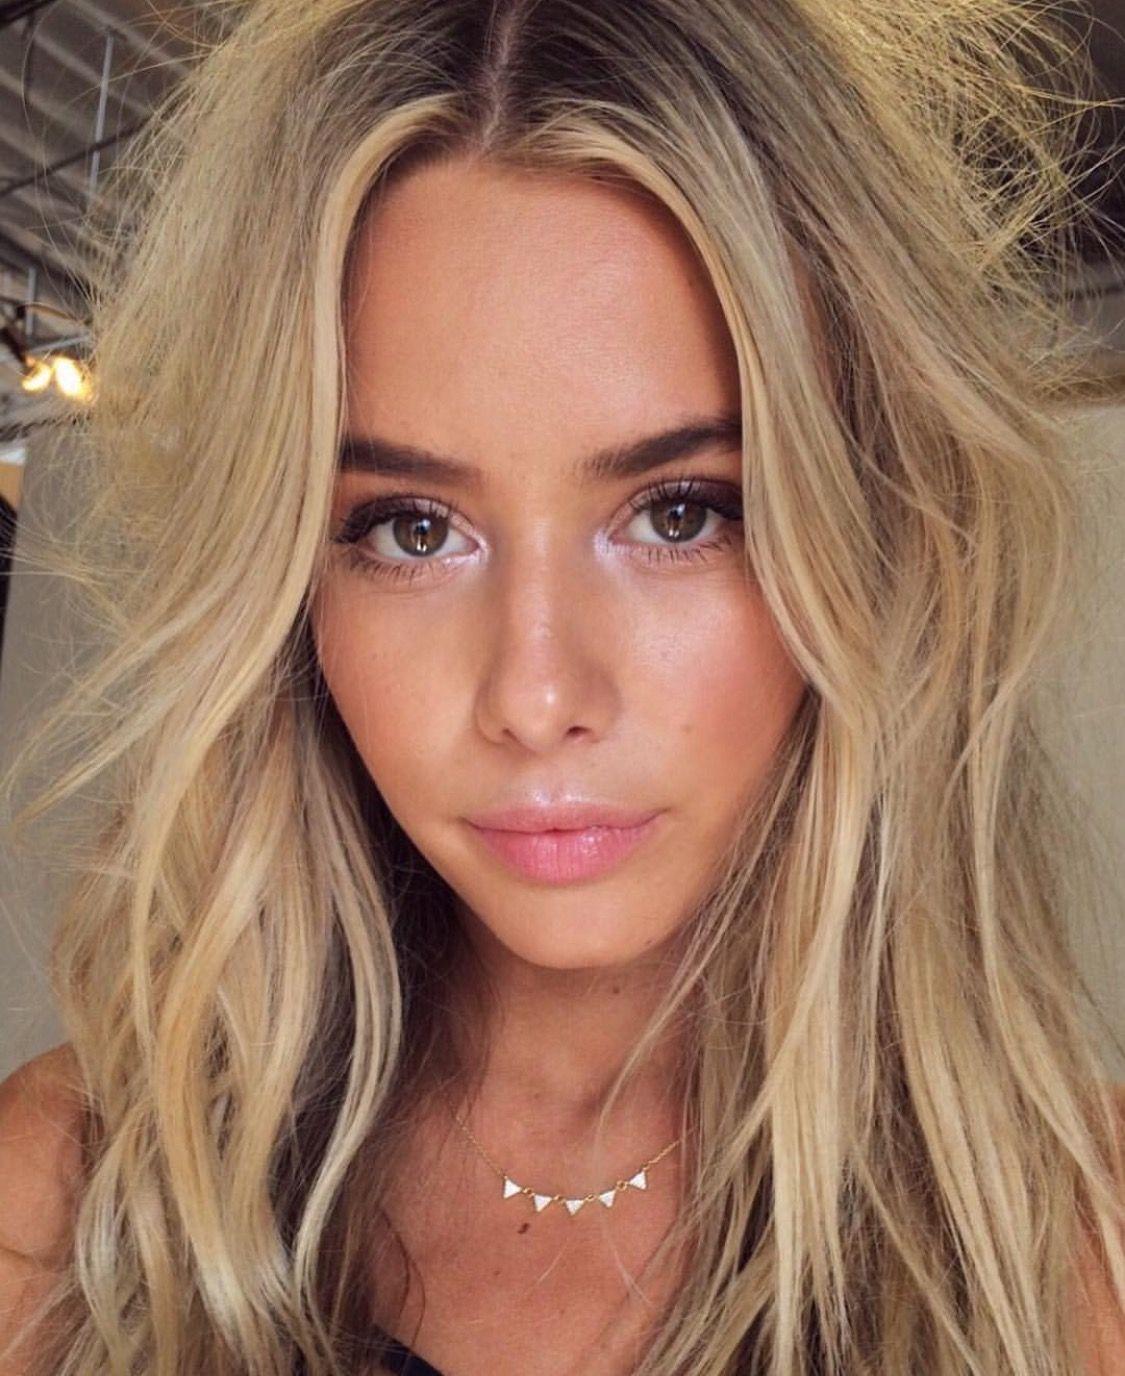 Beautiful skin, fresh and glowy makeup perfect for senior